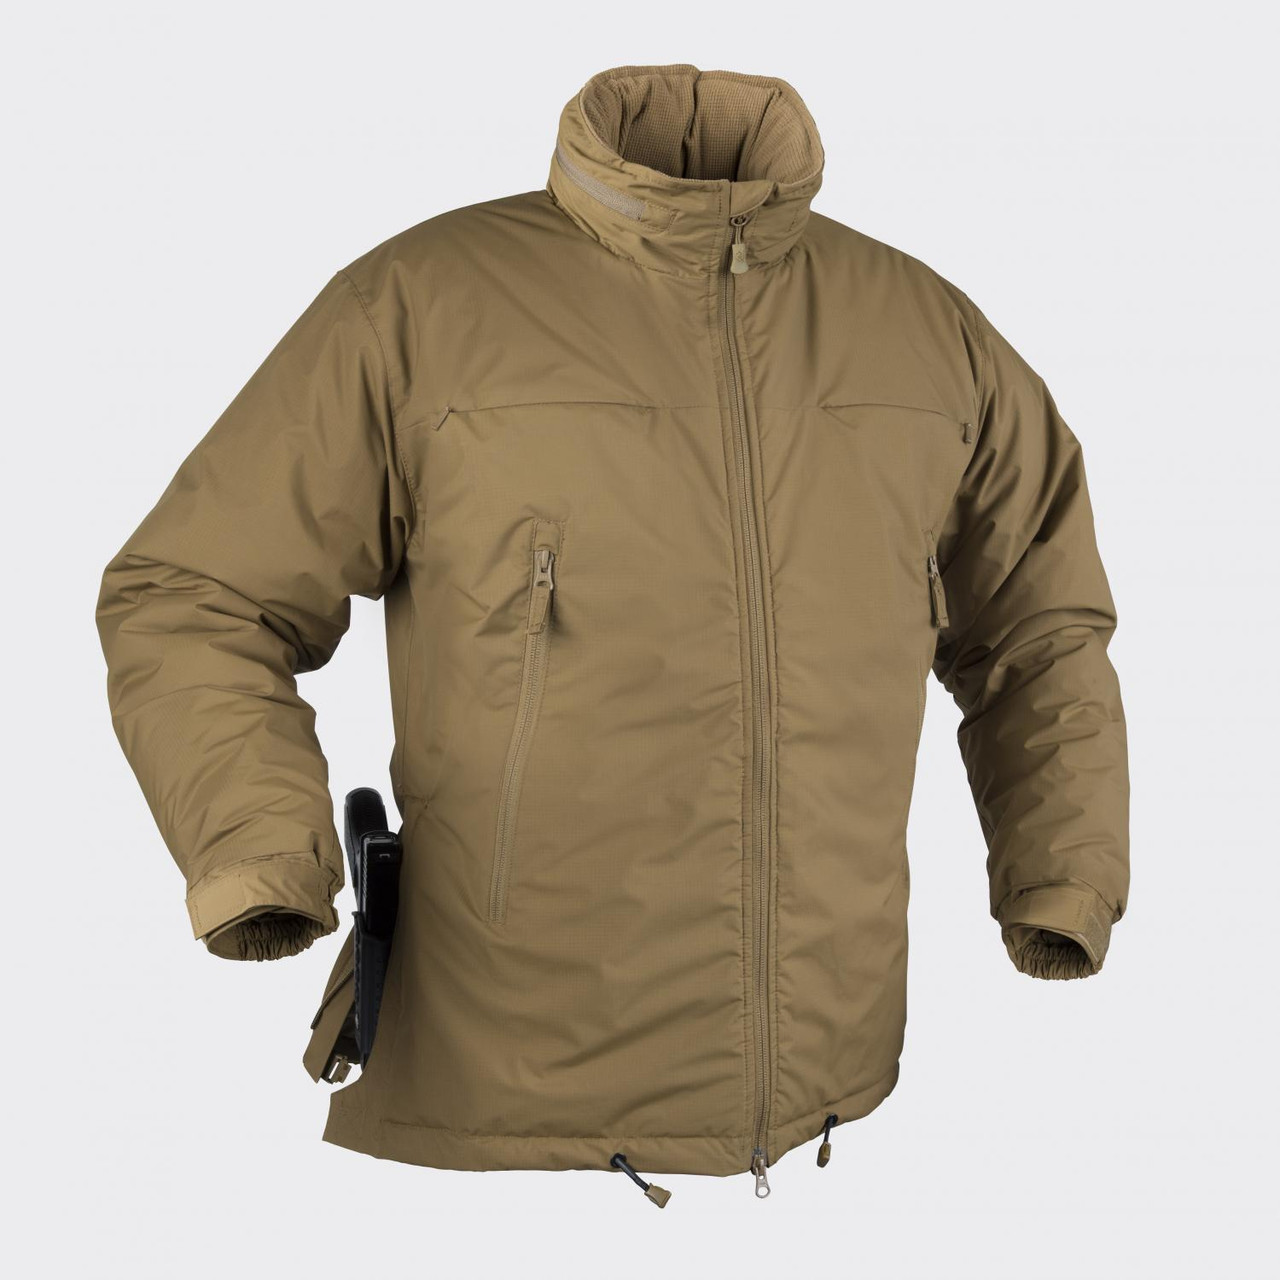 Куртка Cold Weather Clothing Helikon-Tex® Husky Winter Tactical Jacket - Койот